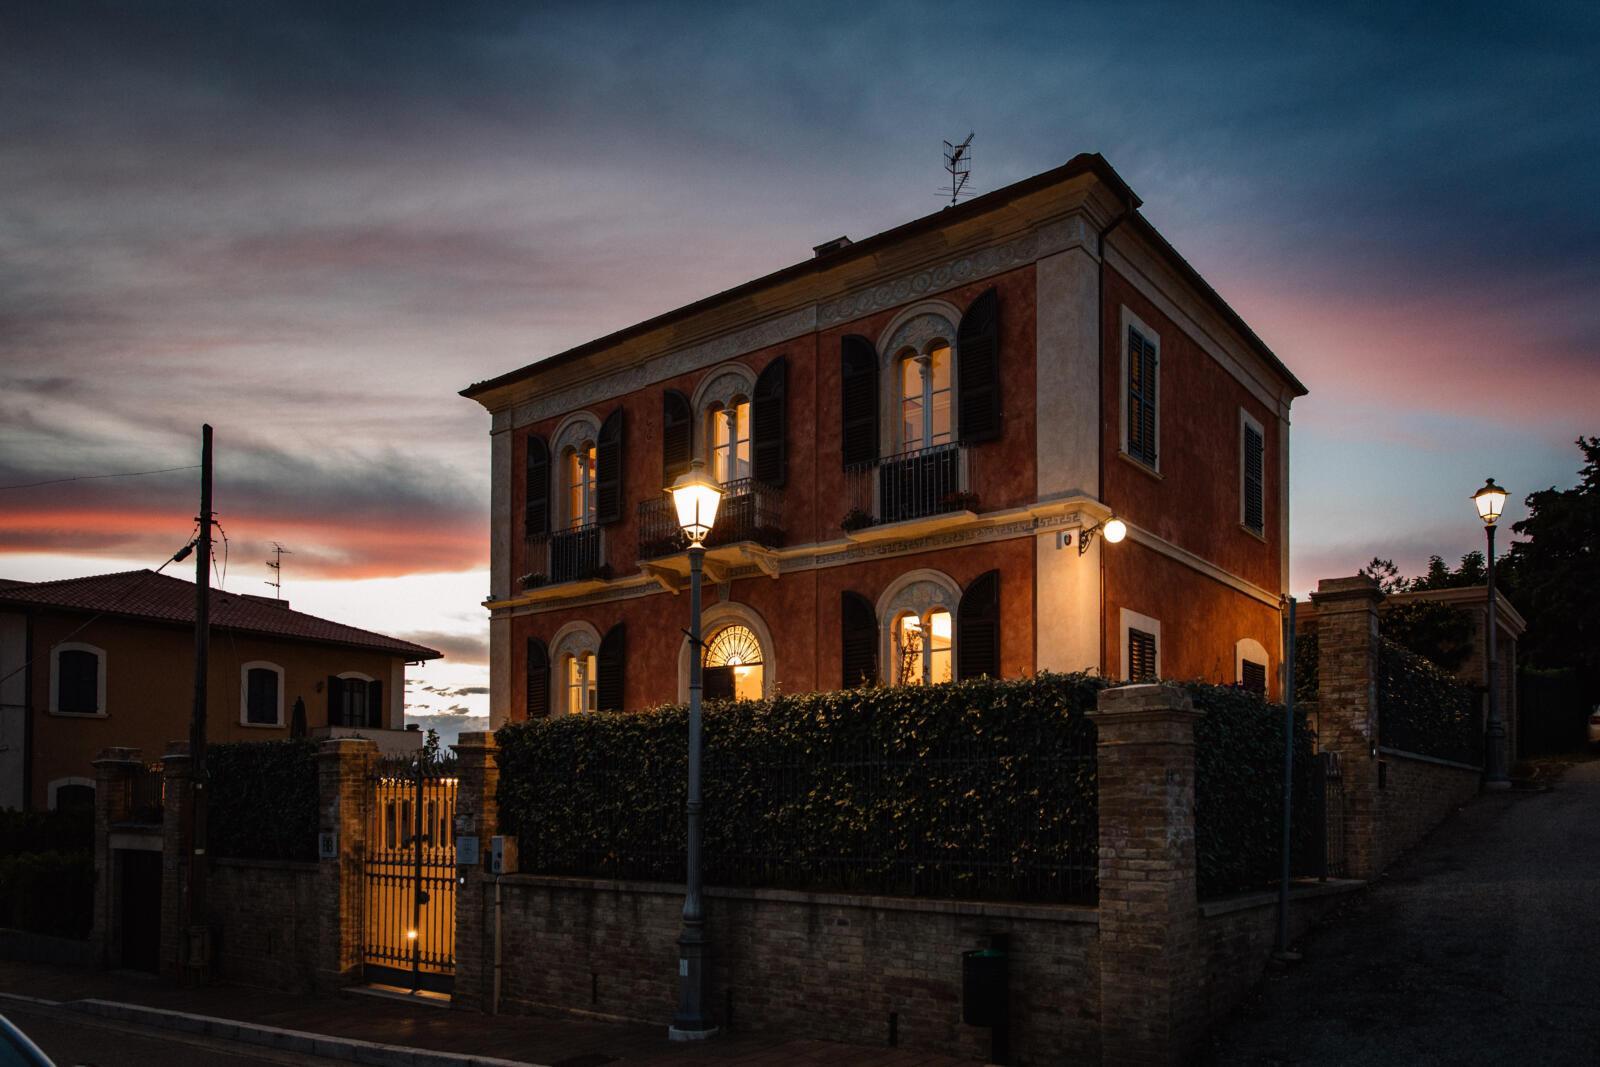 Foto in notturna - B&B Tortoreto Villa Mascitti - Bed and Breakfast Abruzzo